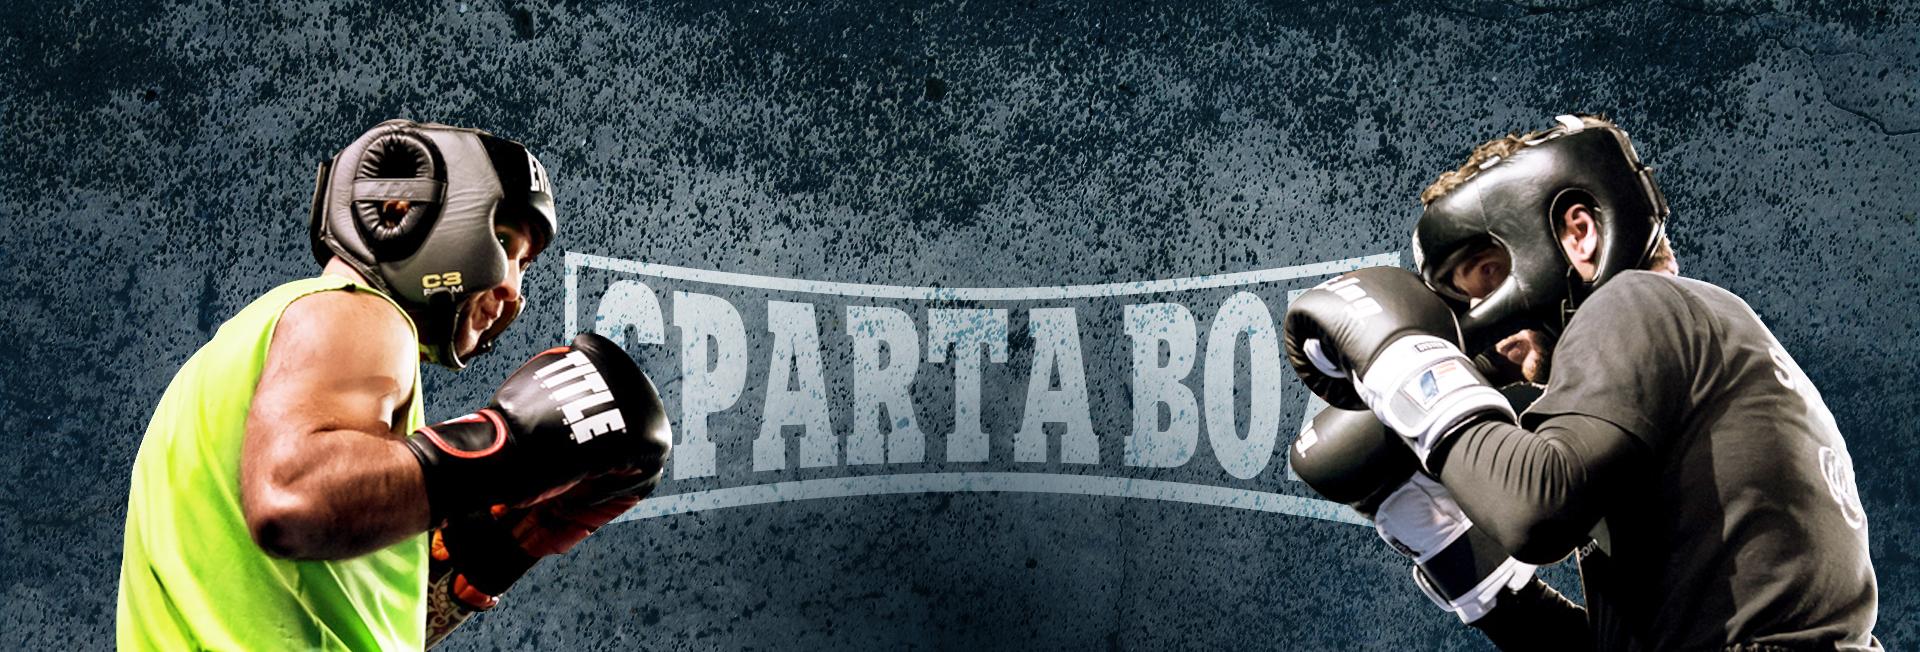 SpartaBox: Бокс